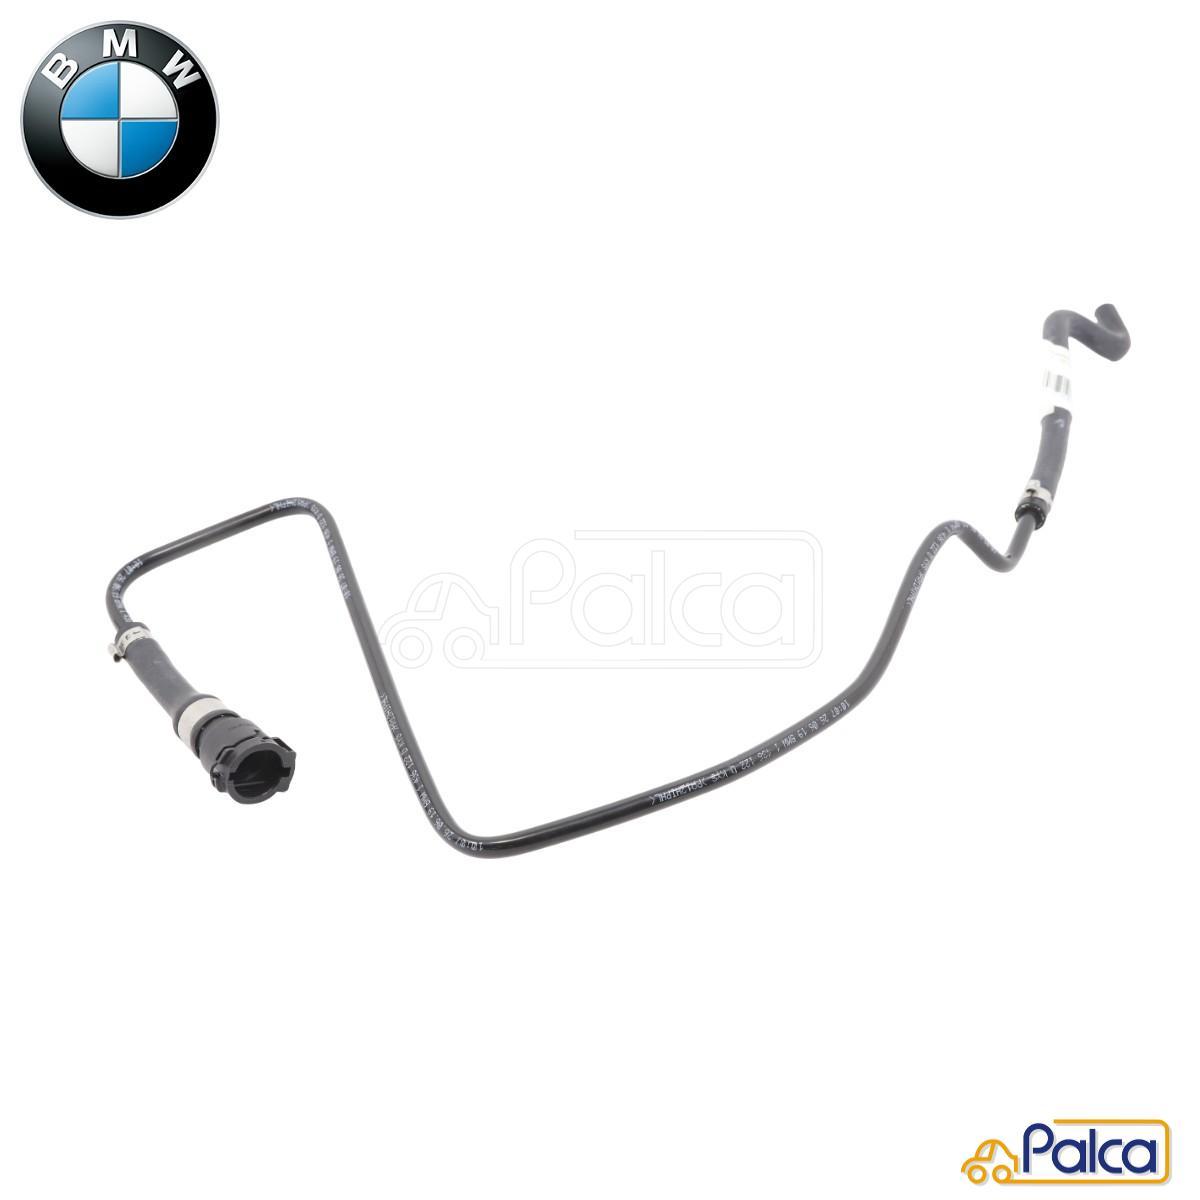 BMW純正 新品 あす楽 BMW MINI ミニ ウォーターホース クーラントホース ラジエター~タンク E36 純正 受注生産品 2.2i 2020 Z3 2.0 M 11531436122 3.0i 2.8